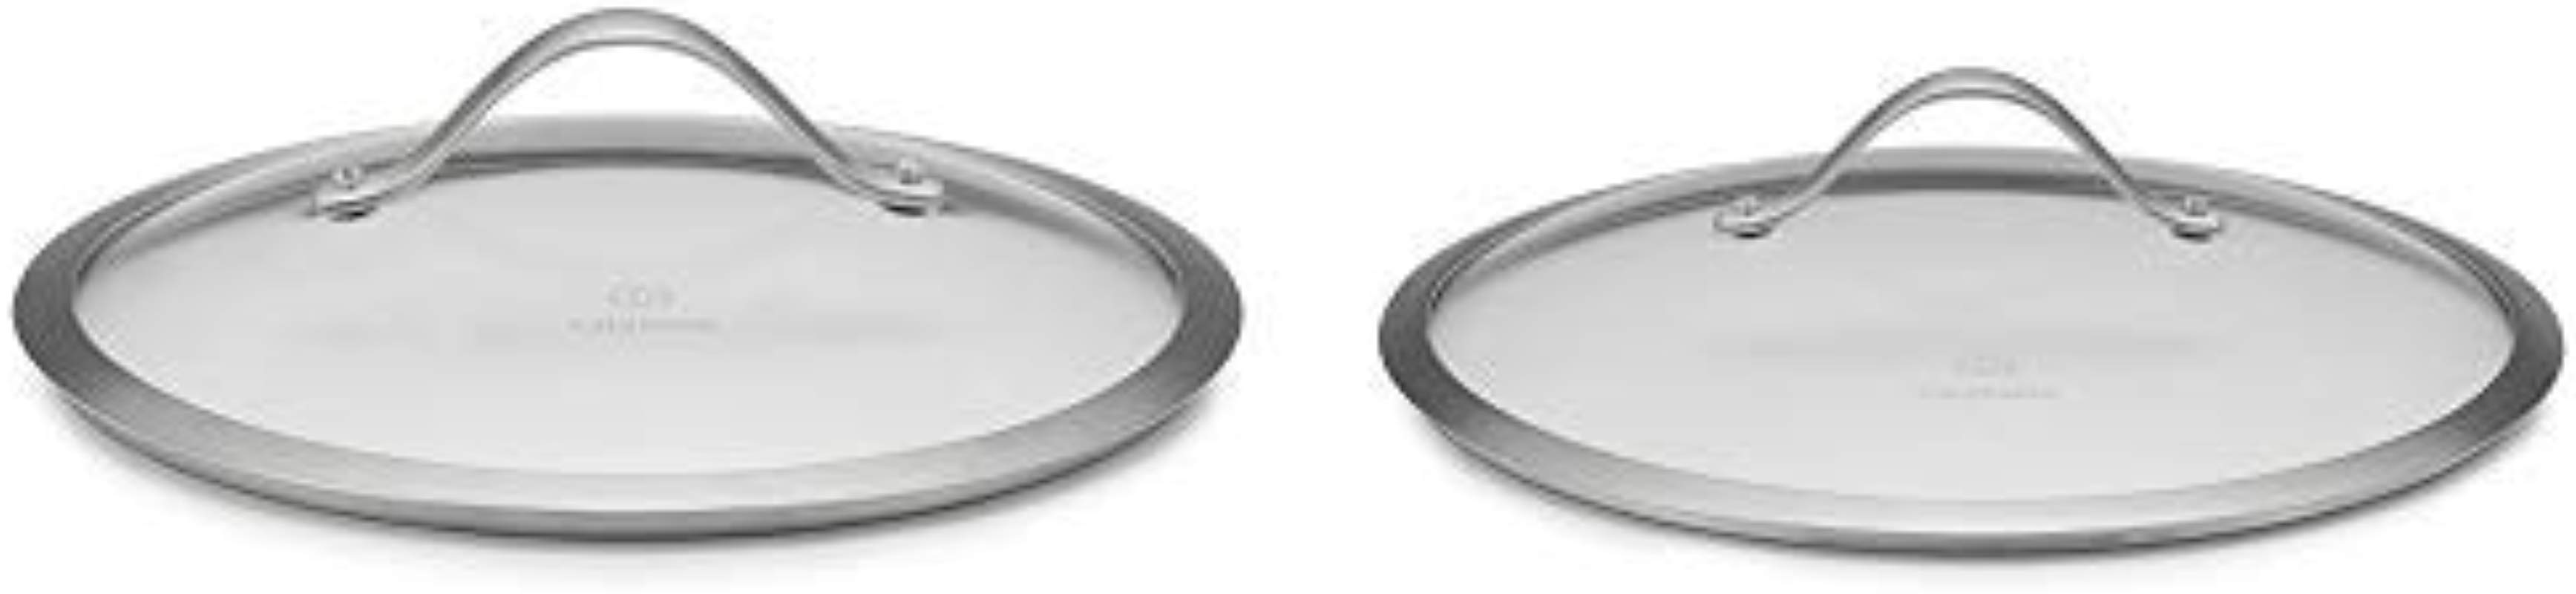 Calphalon Contemporary Pot Pan Lid Glass Cover 10 In AND Calphalon Contemporary Hard Anodized Aluminum Nonstick Cookware Lid 12 Inch Glass